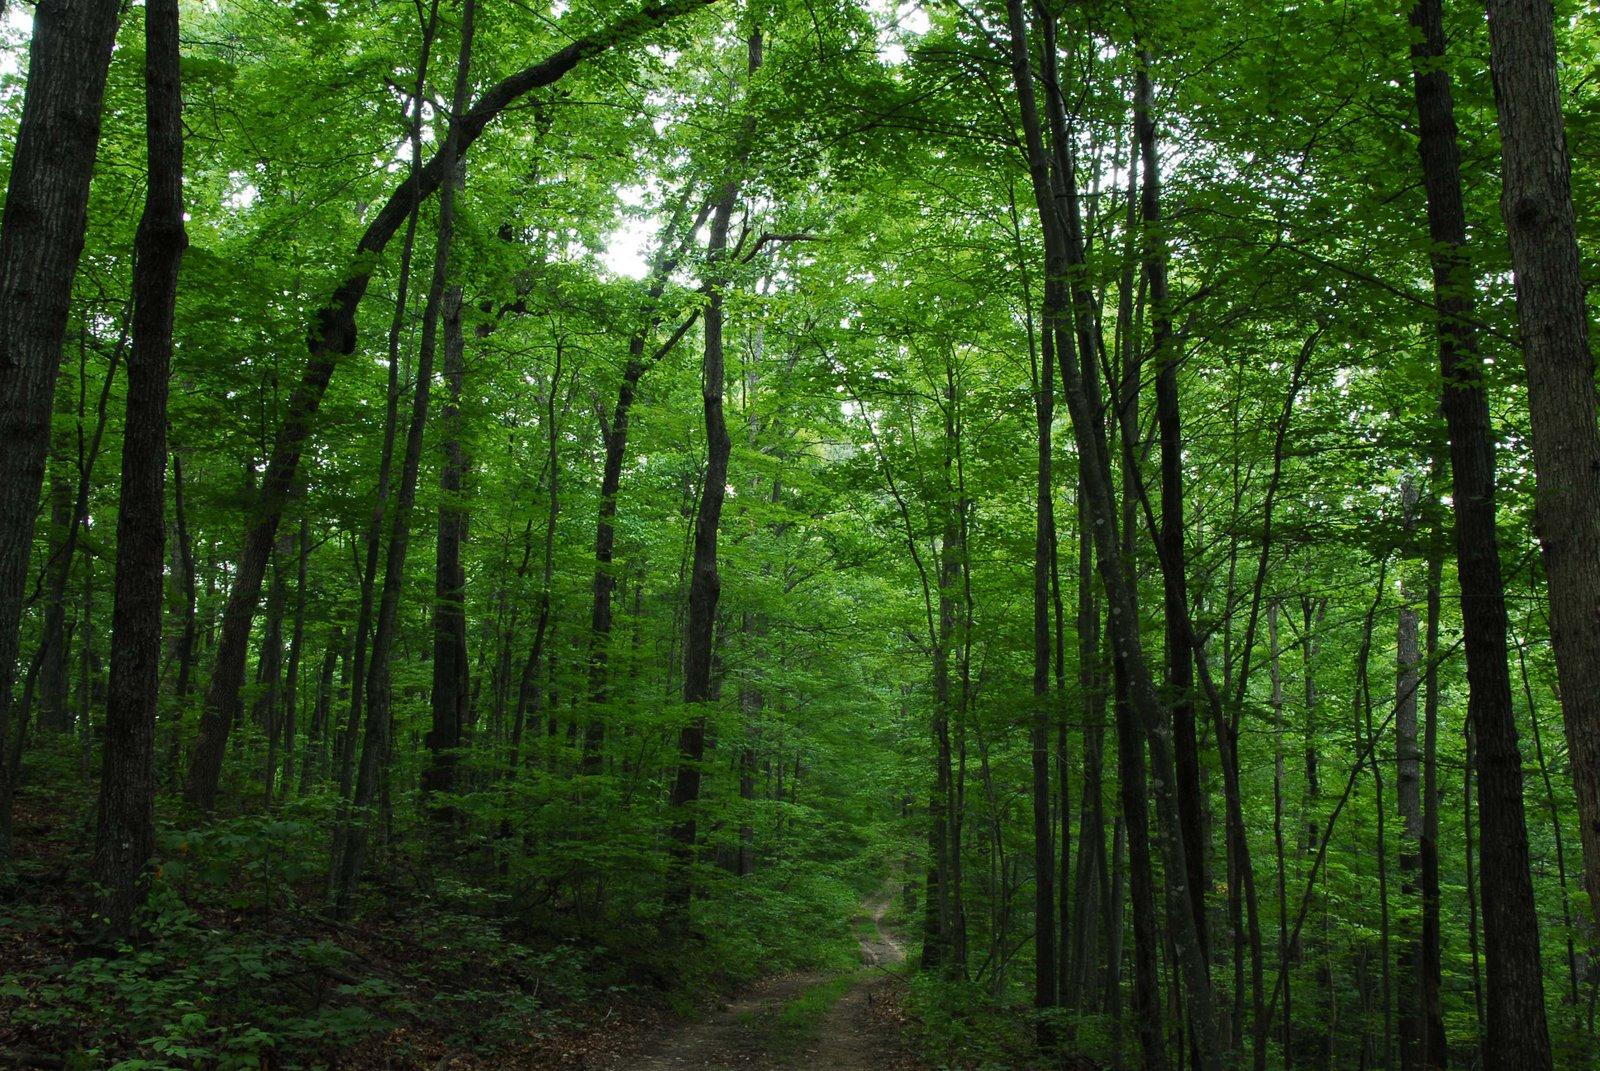 http://1.bp.blogspot.com/-yk303Qejpk8/TWAFHLrnJ0I/AAAAAAAADk4/iYmo35ved8c/s1600/Forest+trail.jpg